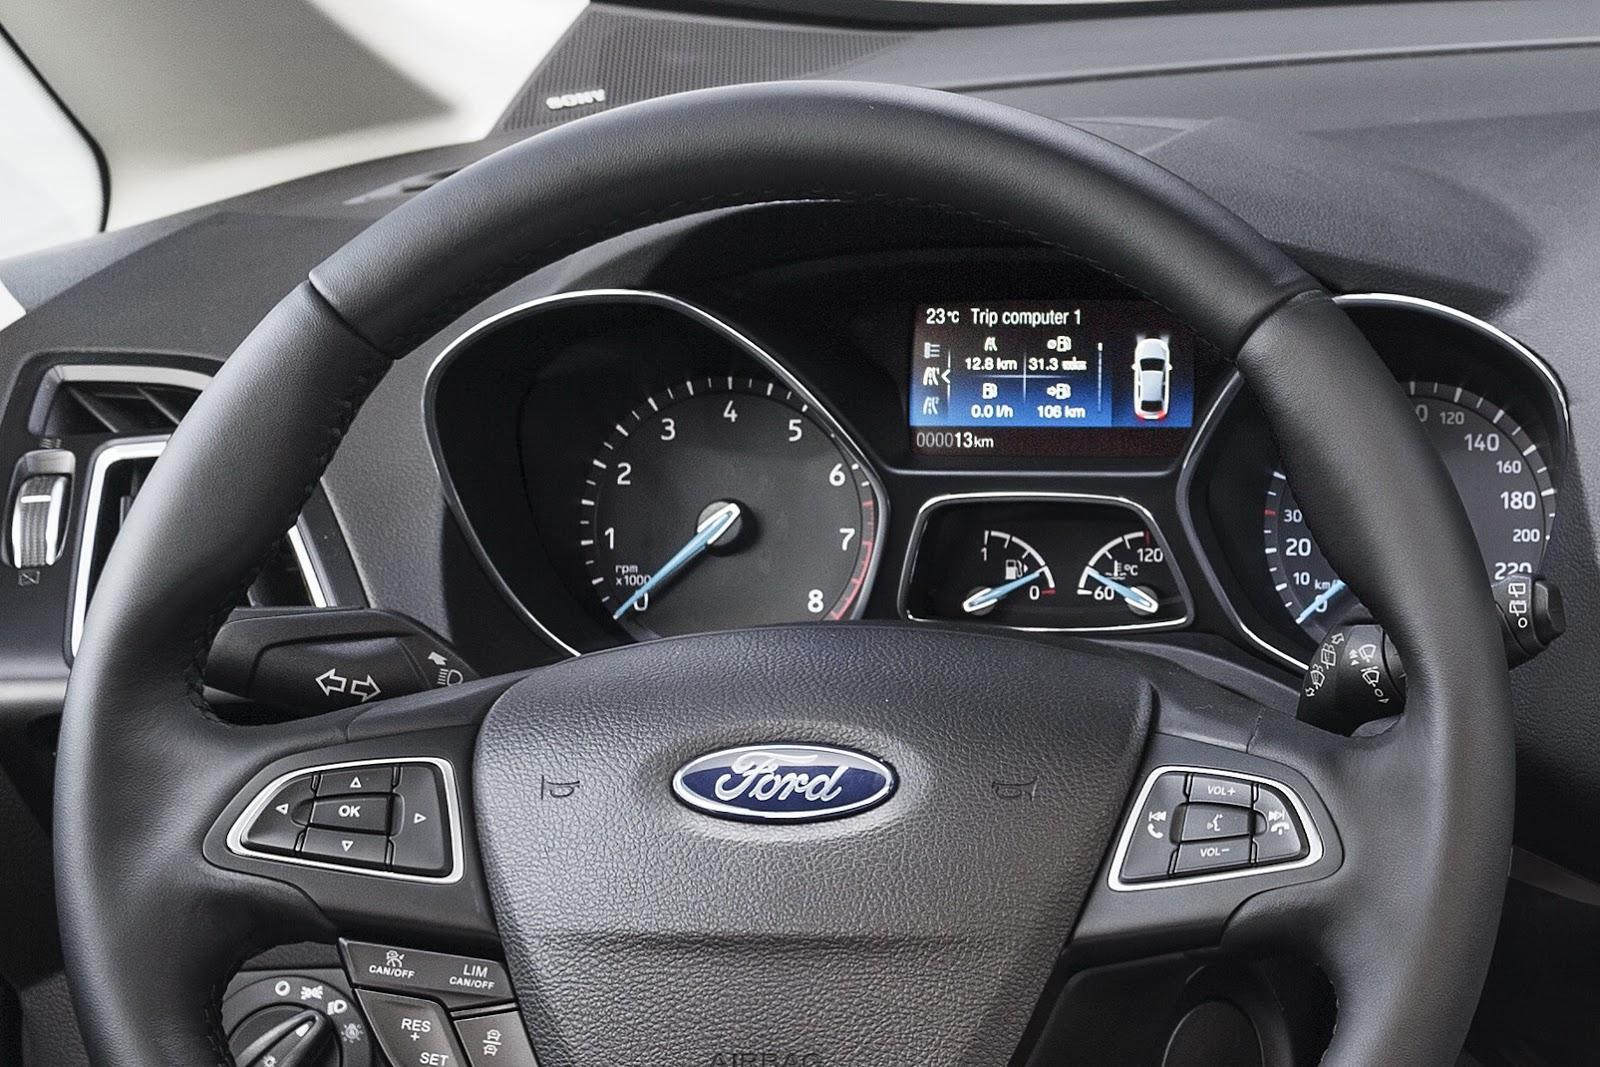 Ford C-MAX 2014 Uplift